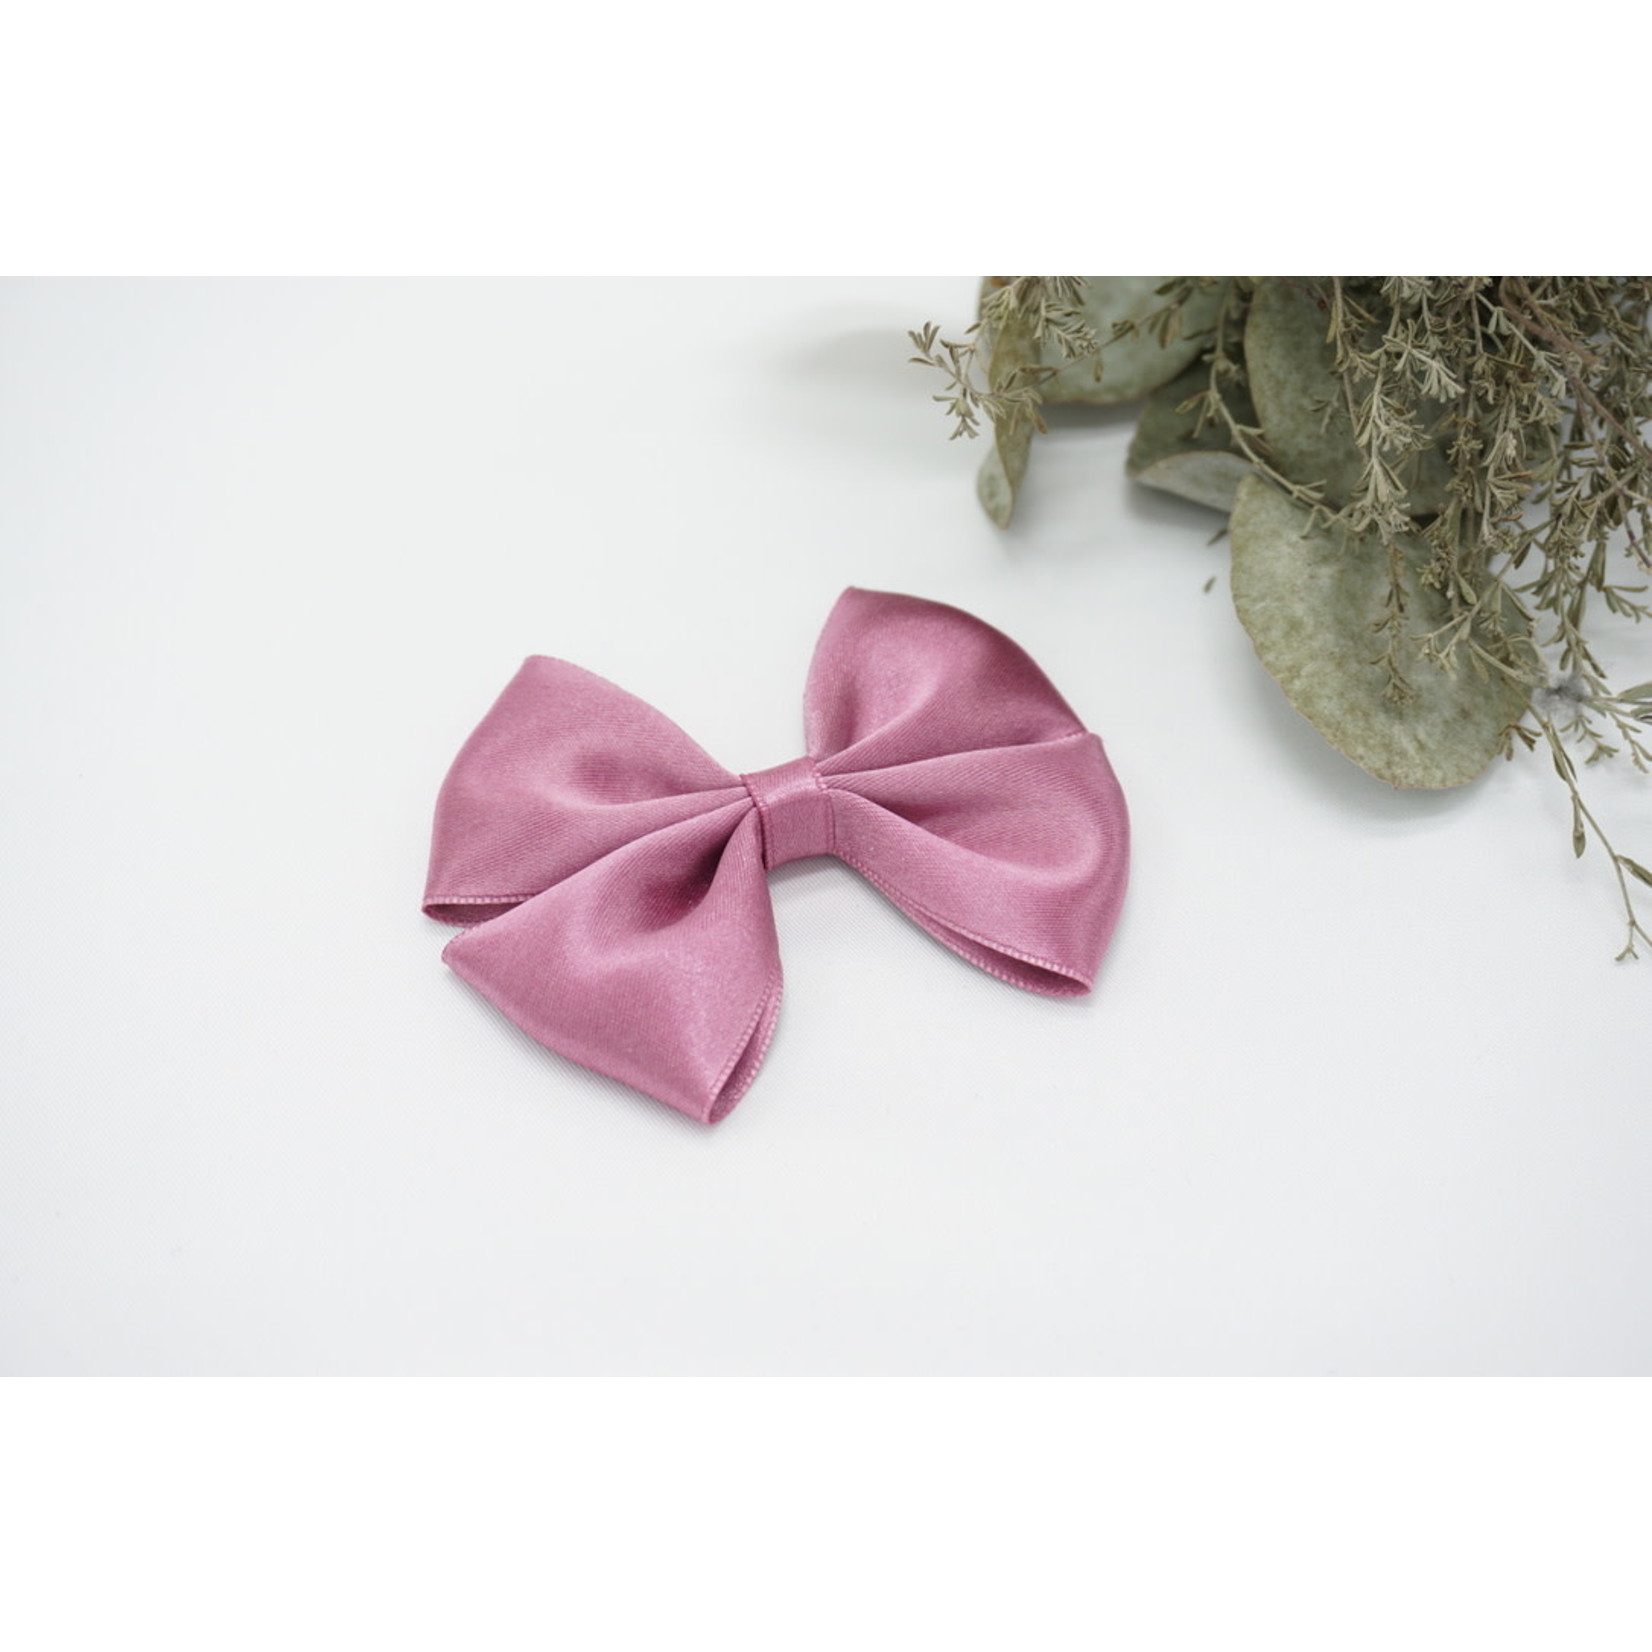 Petite Zara Satin Bow - Amethyst